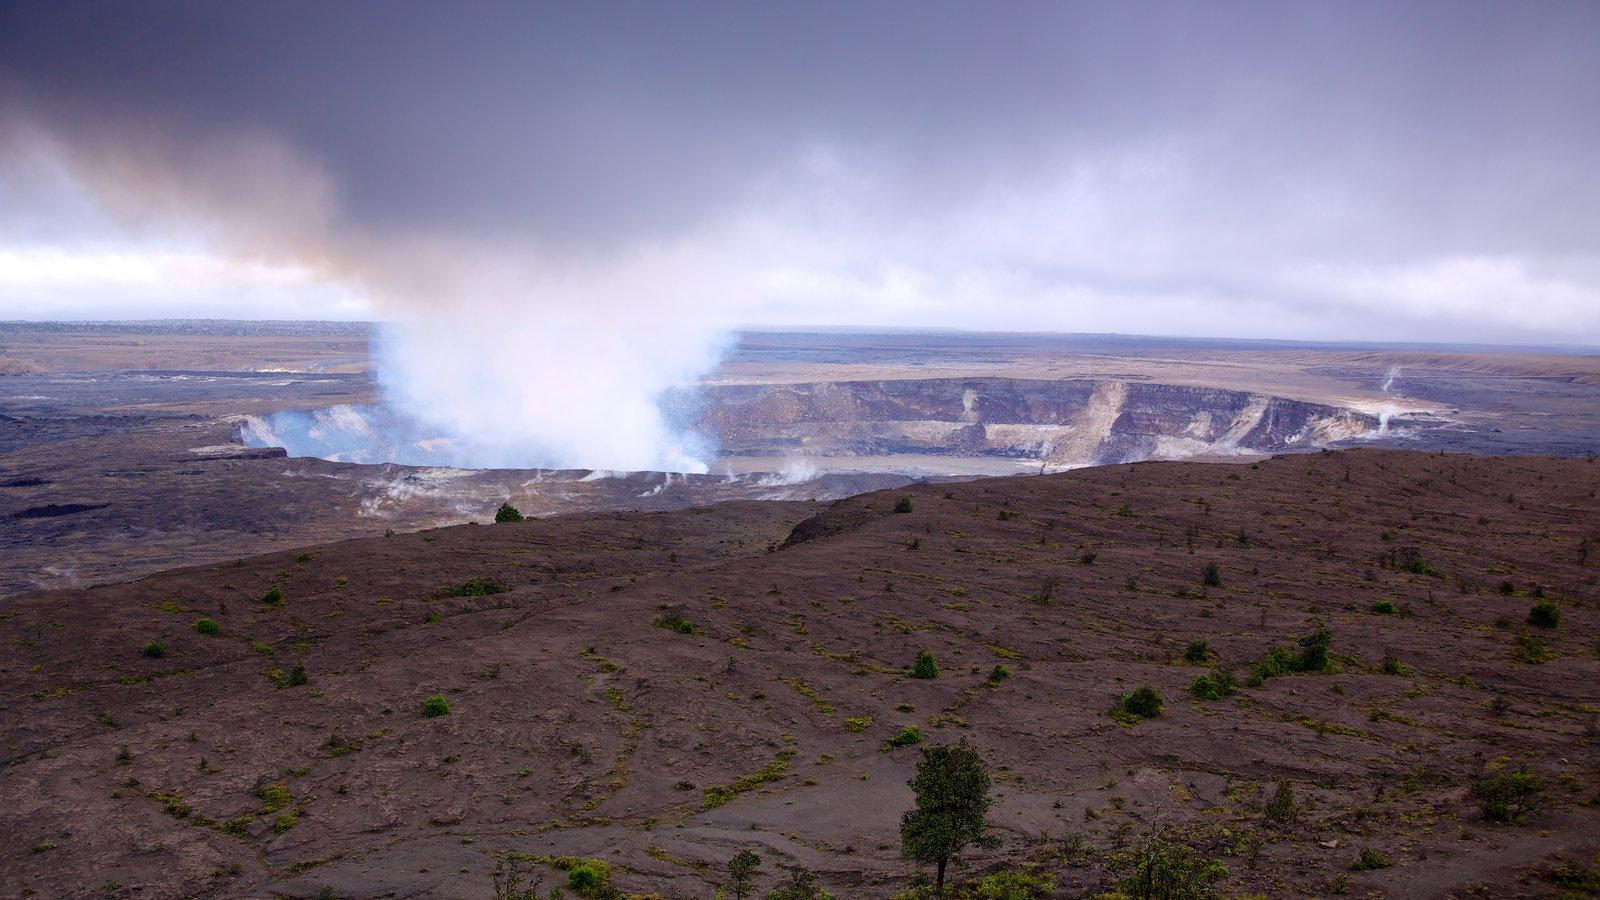 Hawaii Volcanoes National Park caracterizando paisagem e um jardim